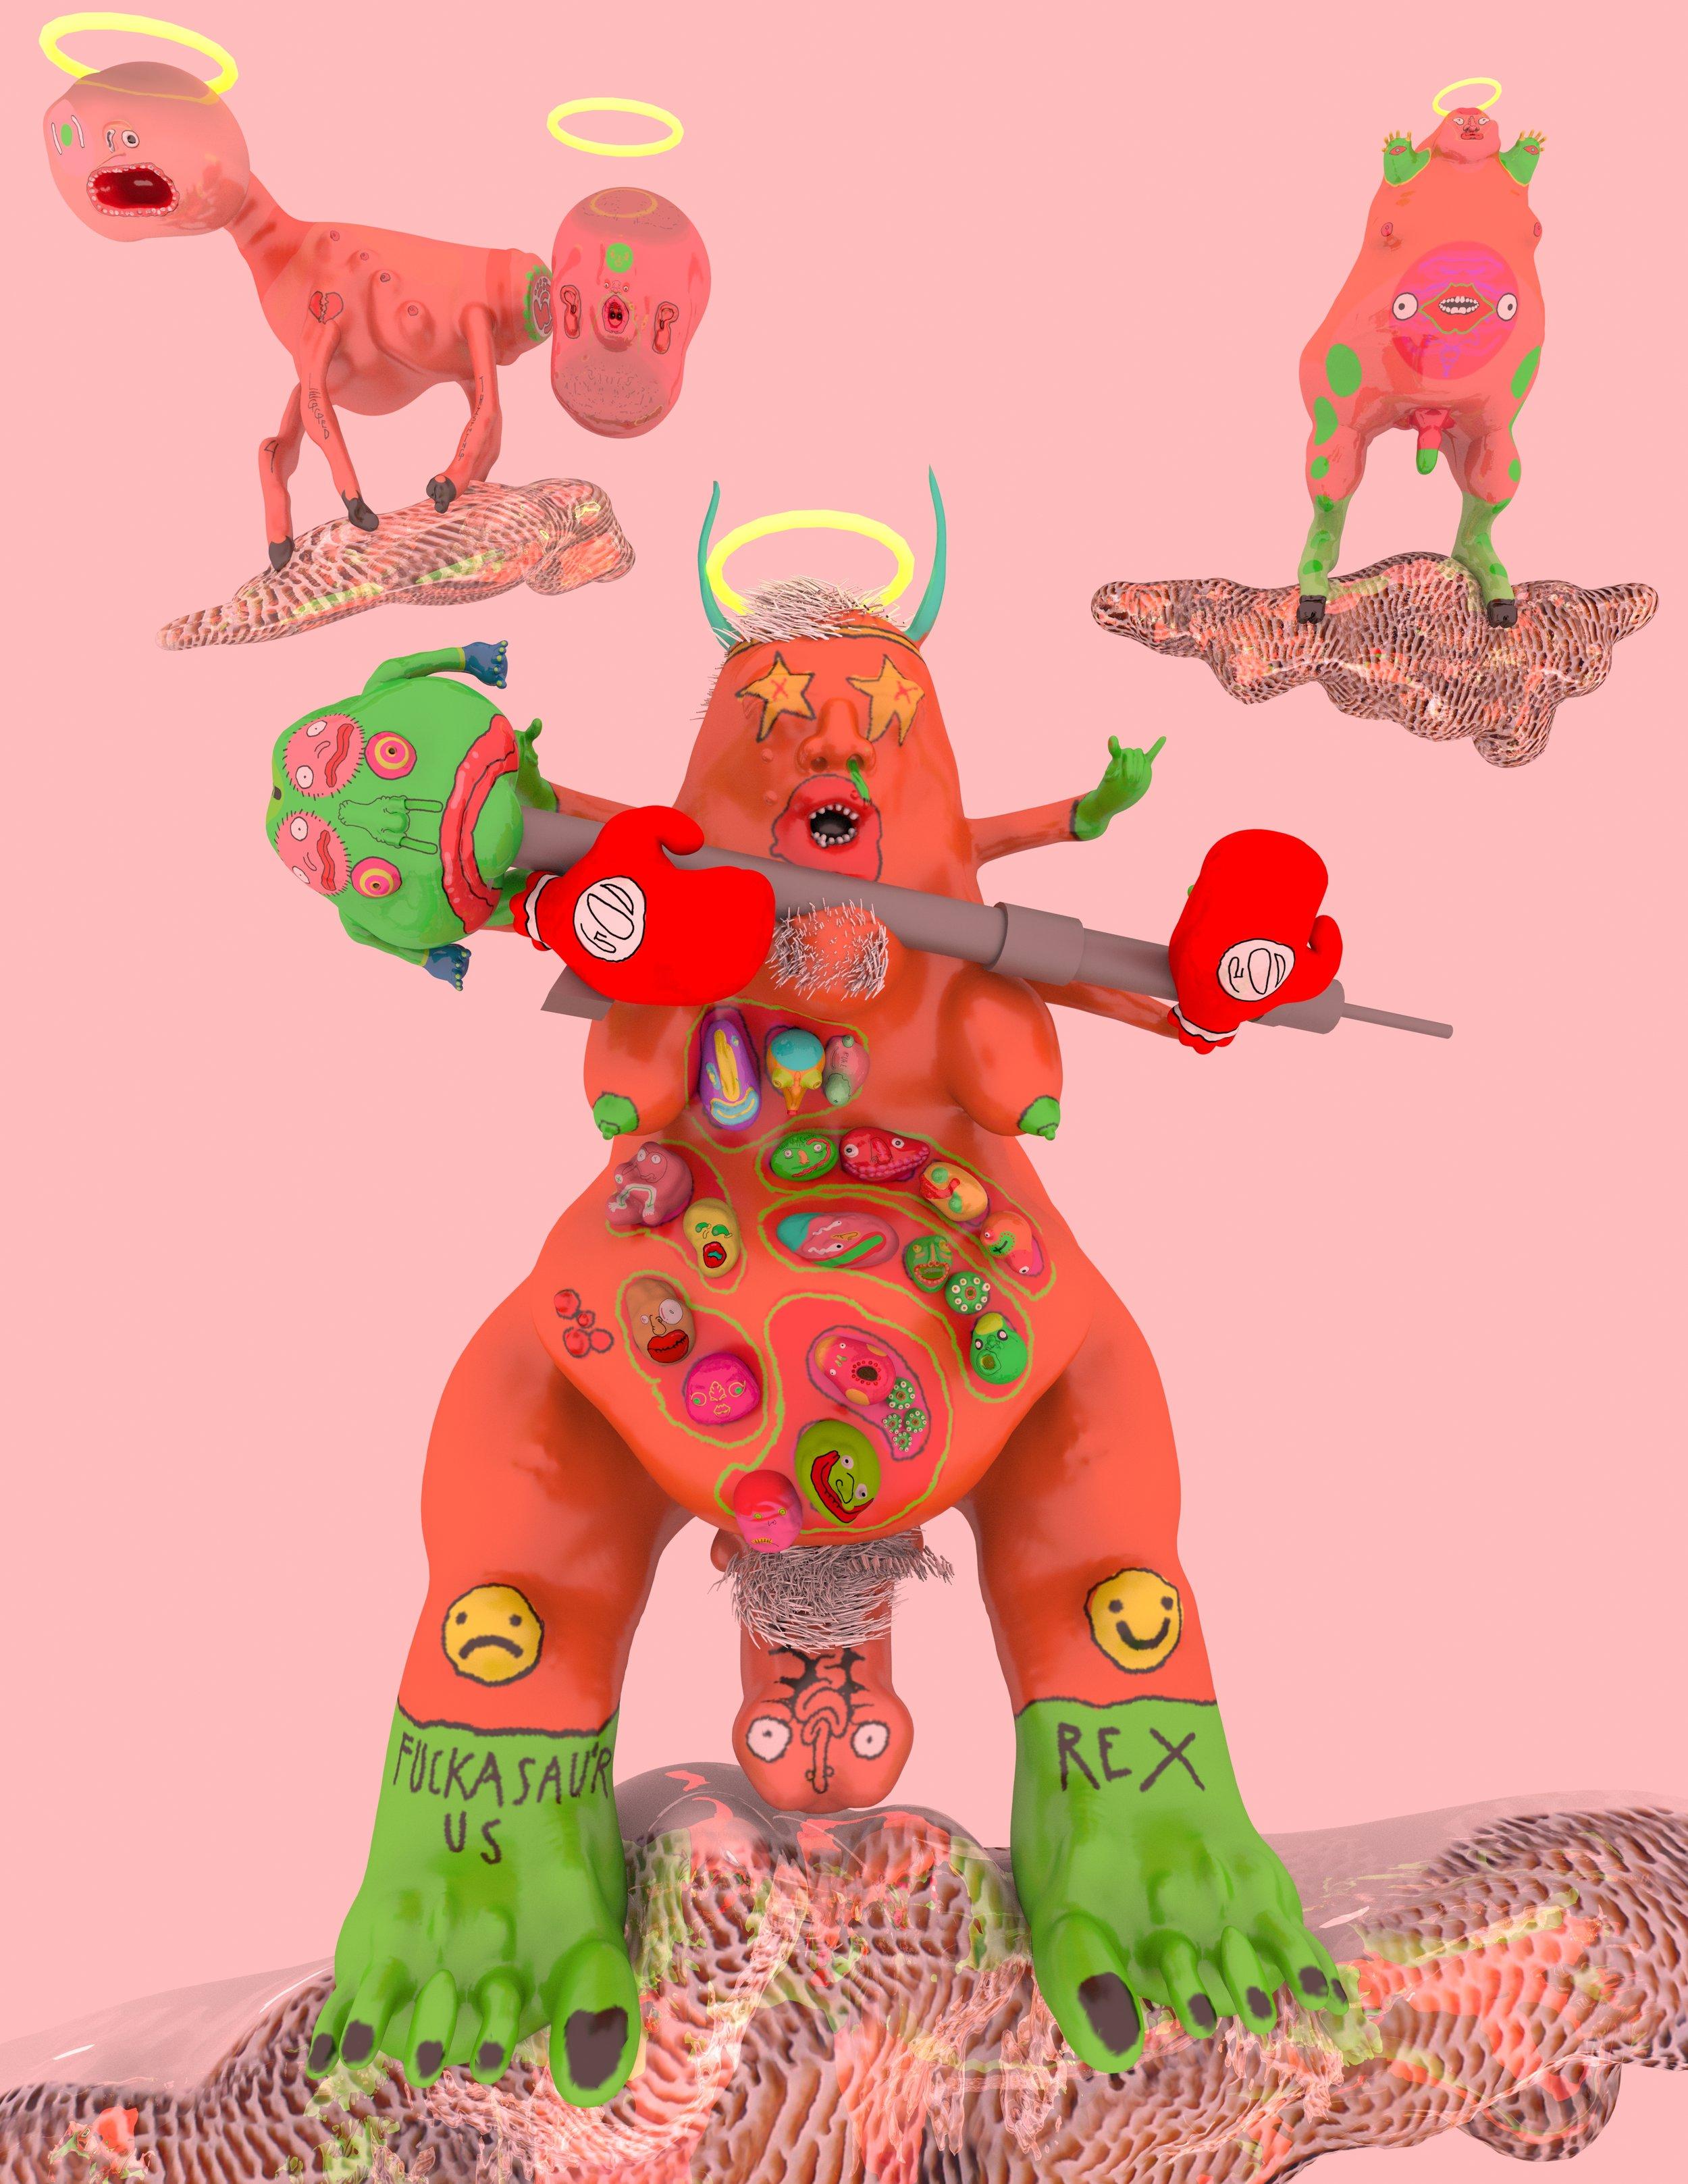 _God is an Orange Dinosaur with an Assult Weapon.jpeg